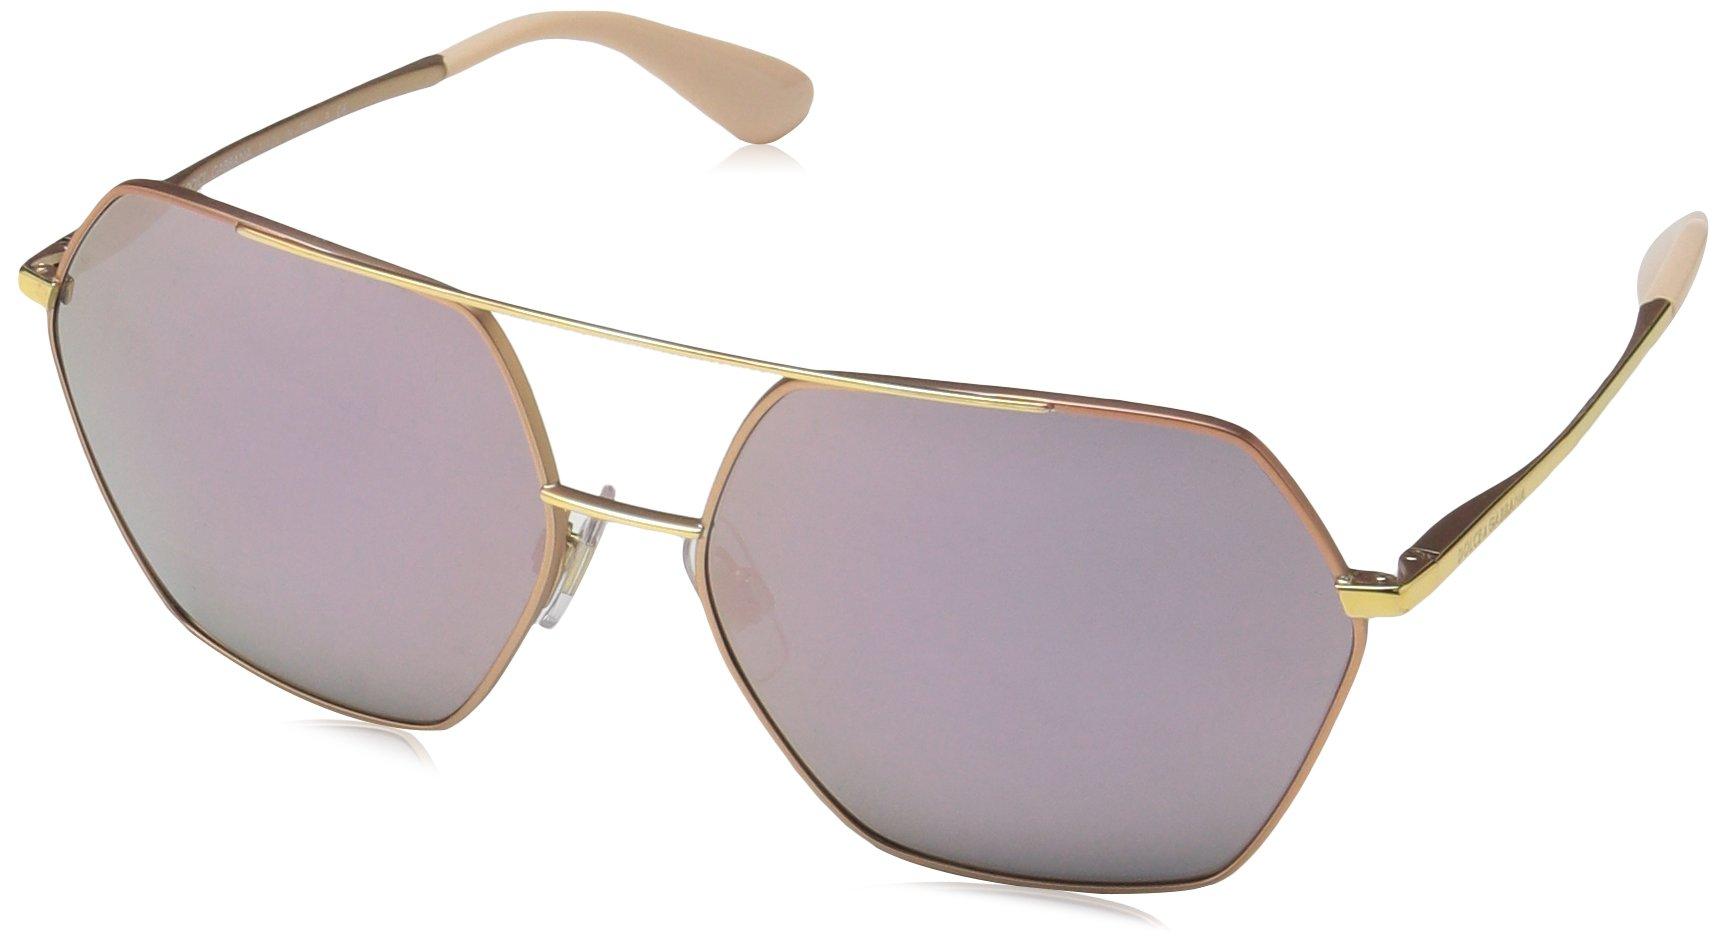 Dolce & Gabbana Women's Metal Woman Non-Polarized Iridium Square Sunglasses, Matte Pink Gold, 59.2 mm by Dolce & Gabbana (Image #1)